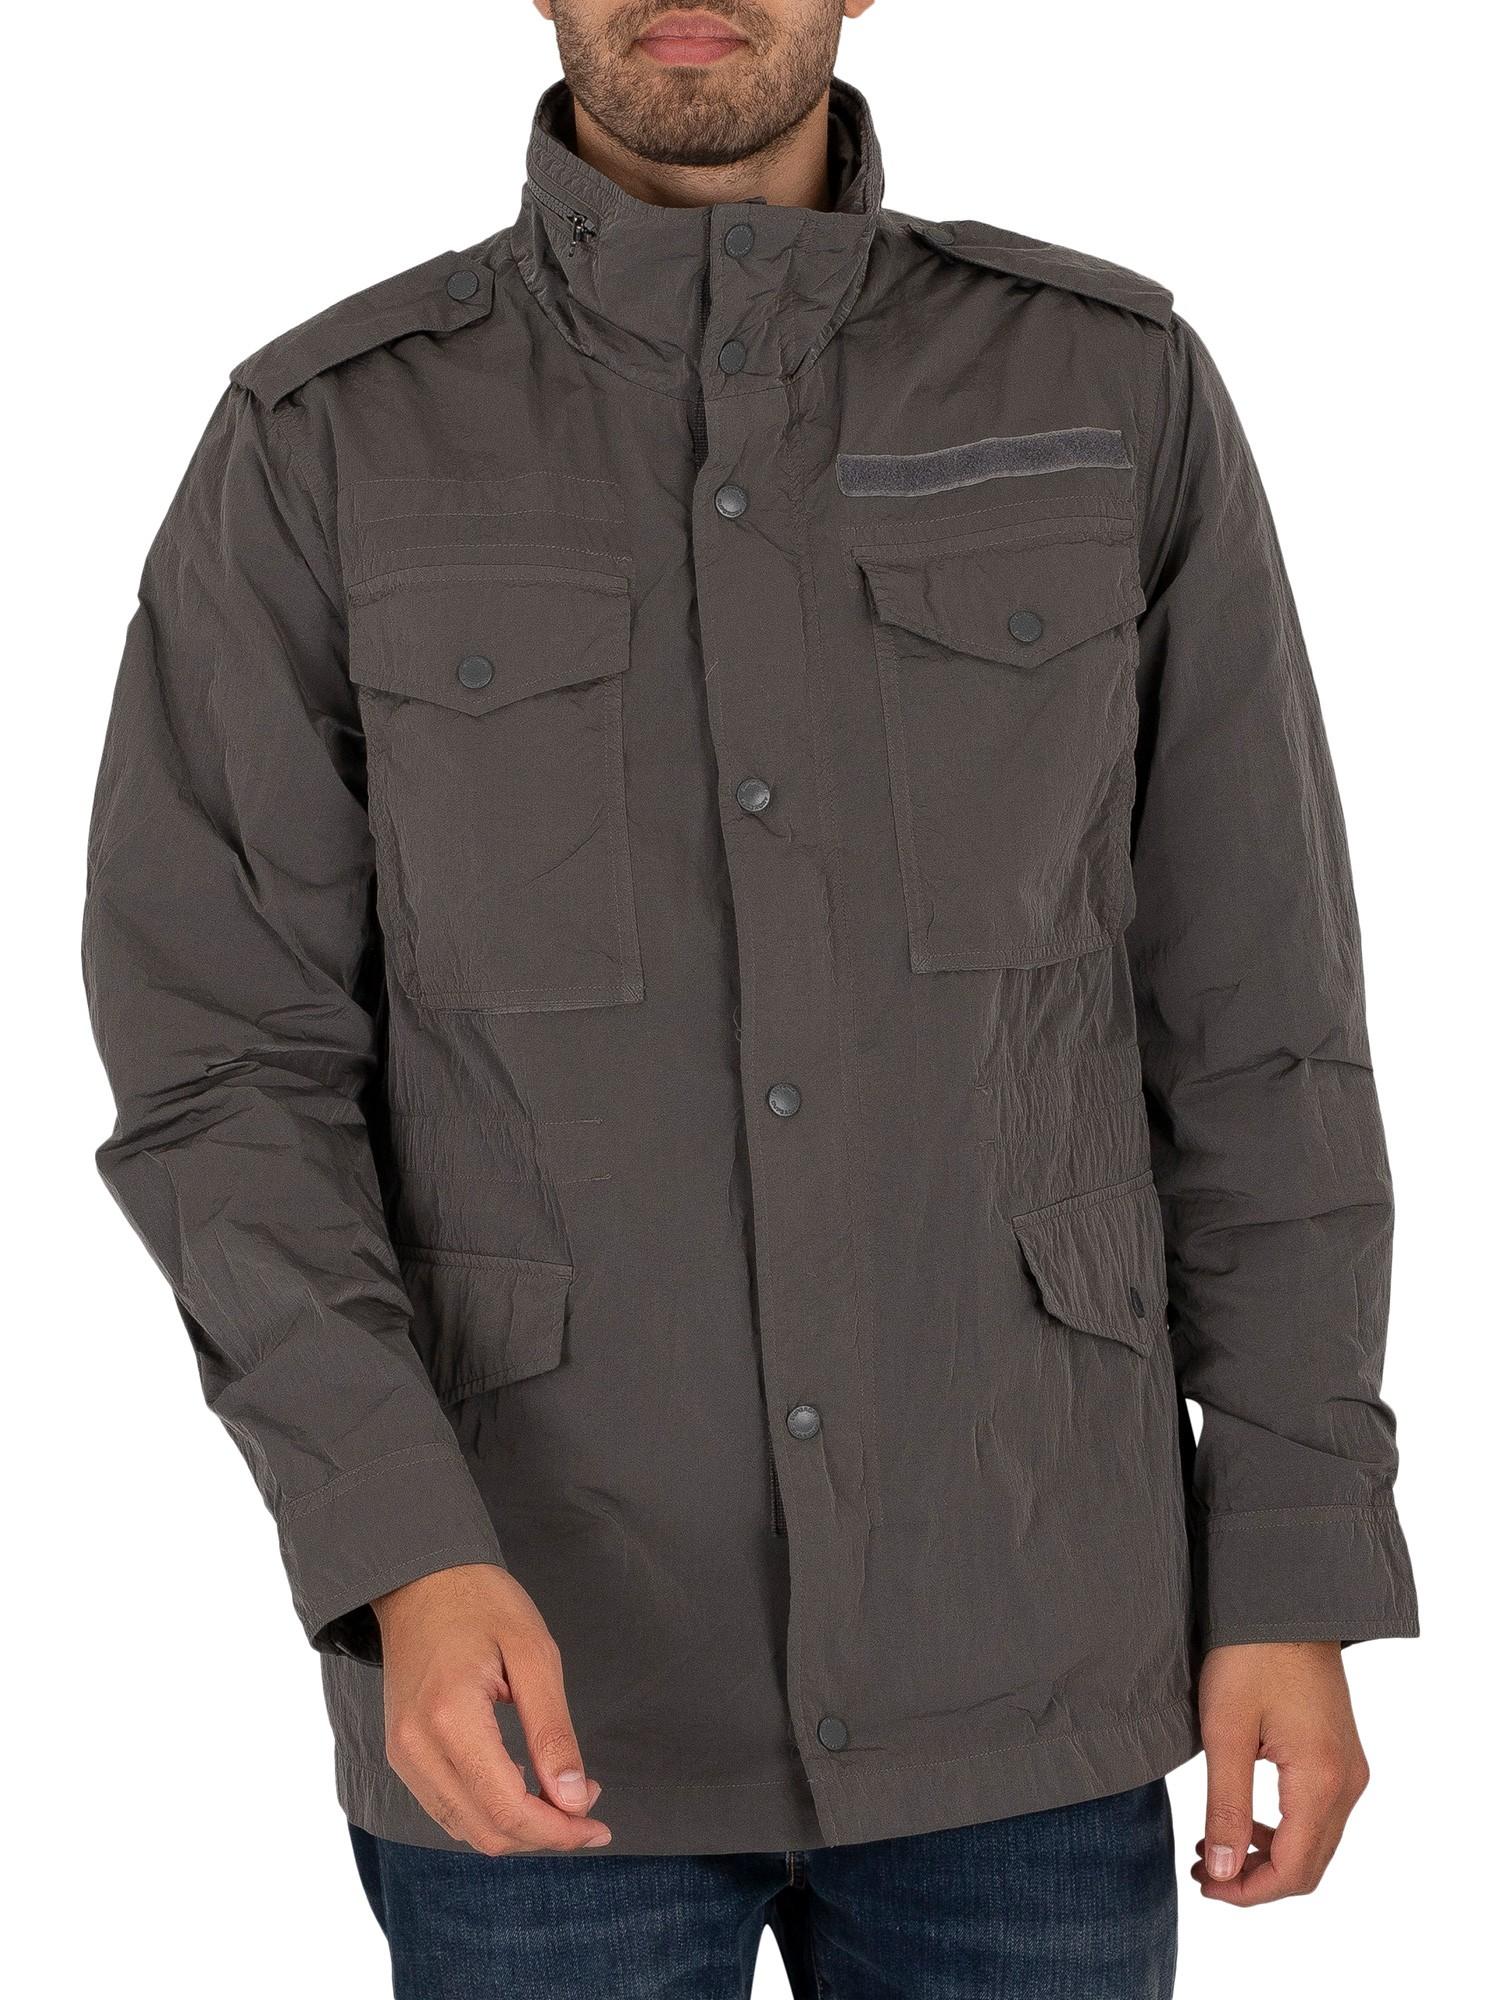 New-Military-Field-Jacket